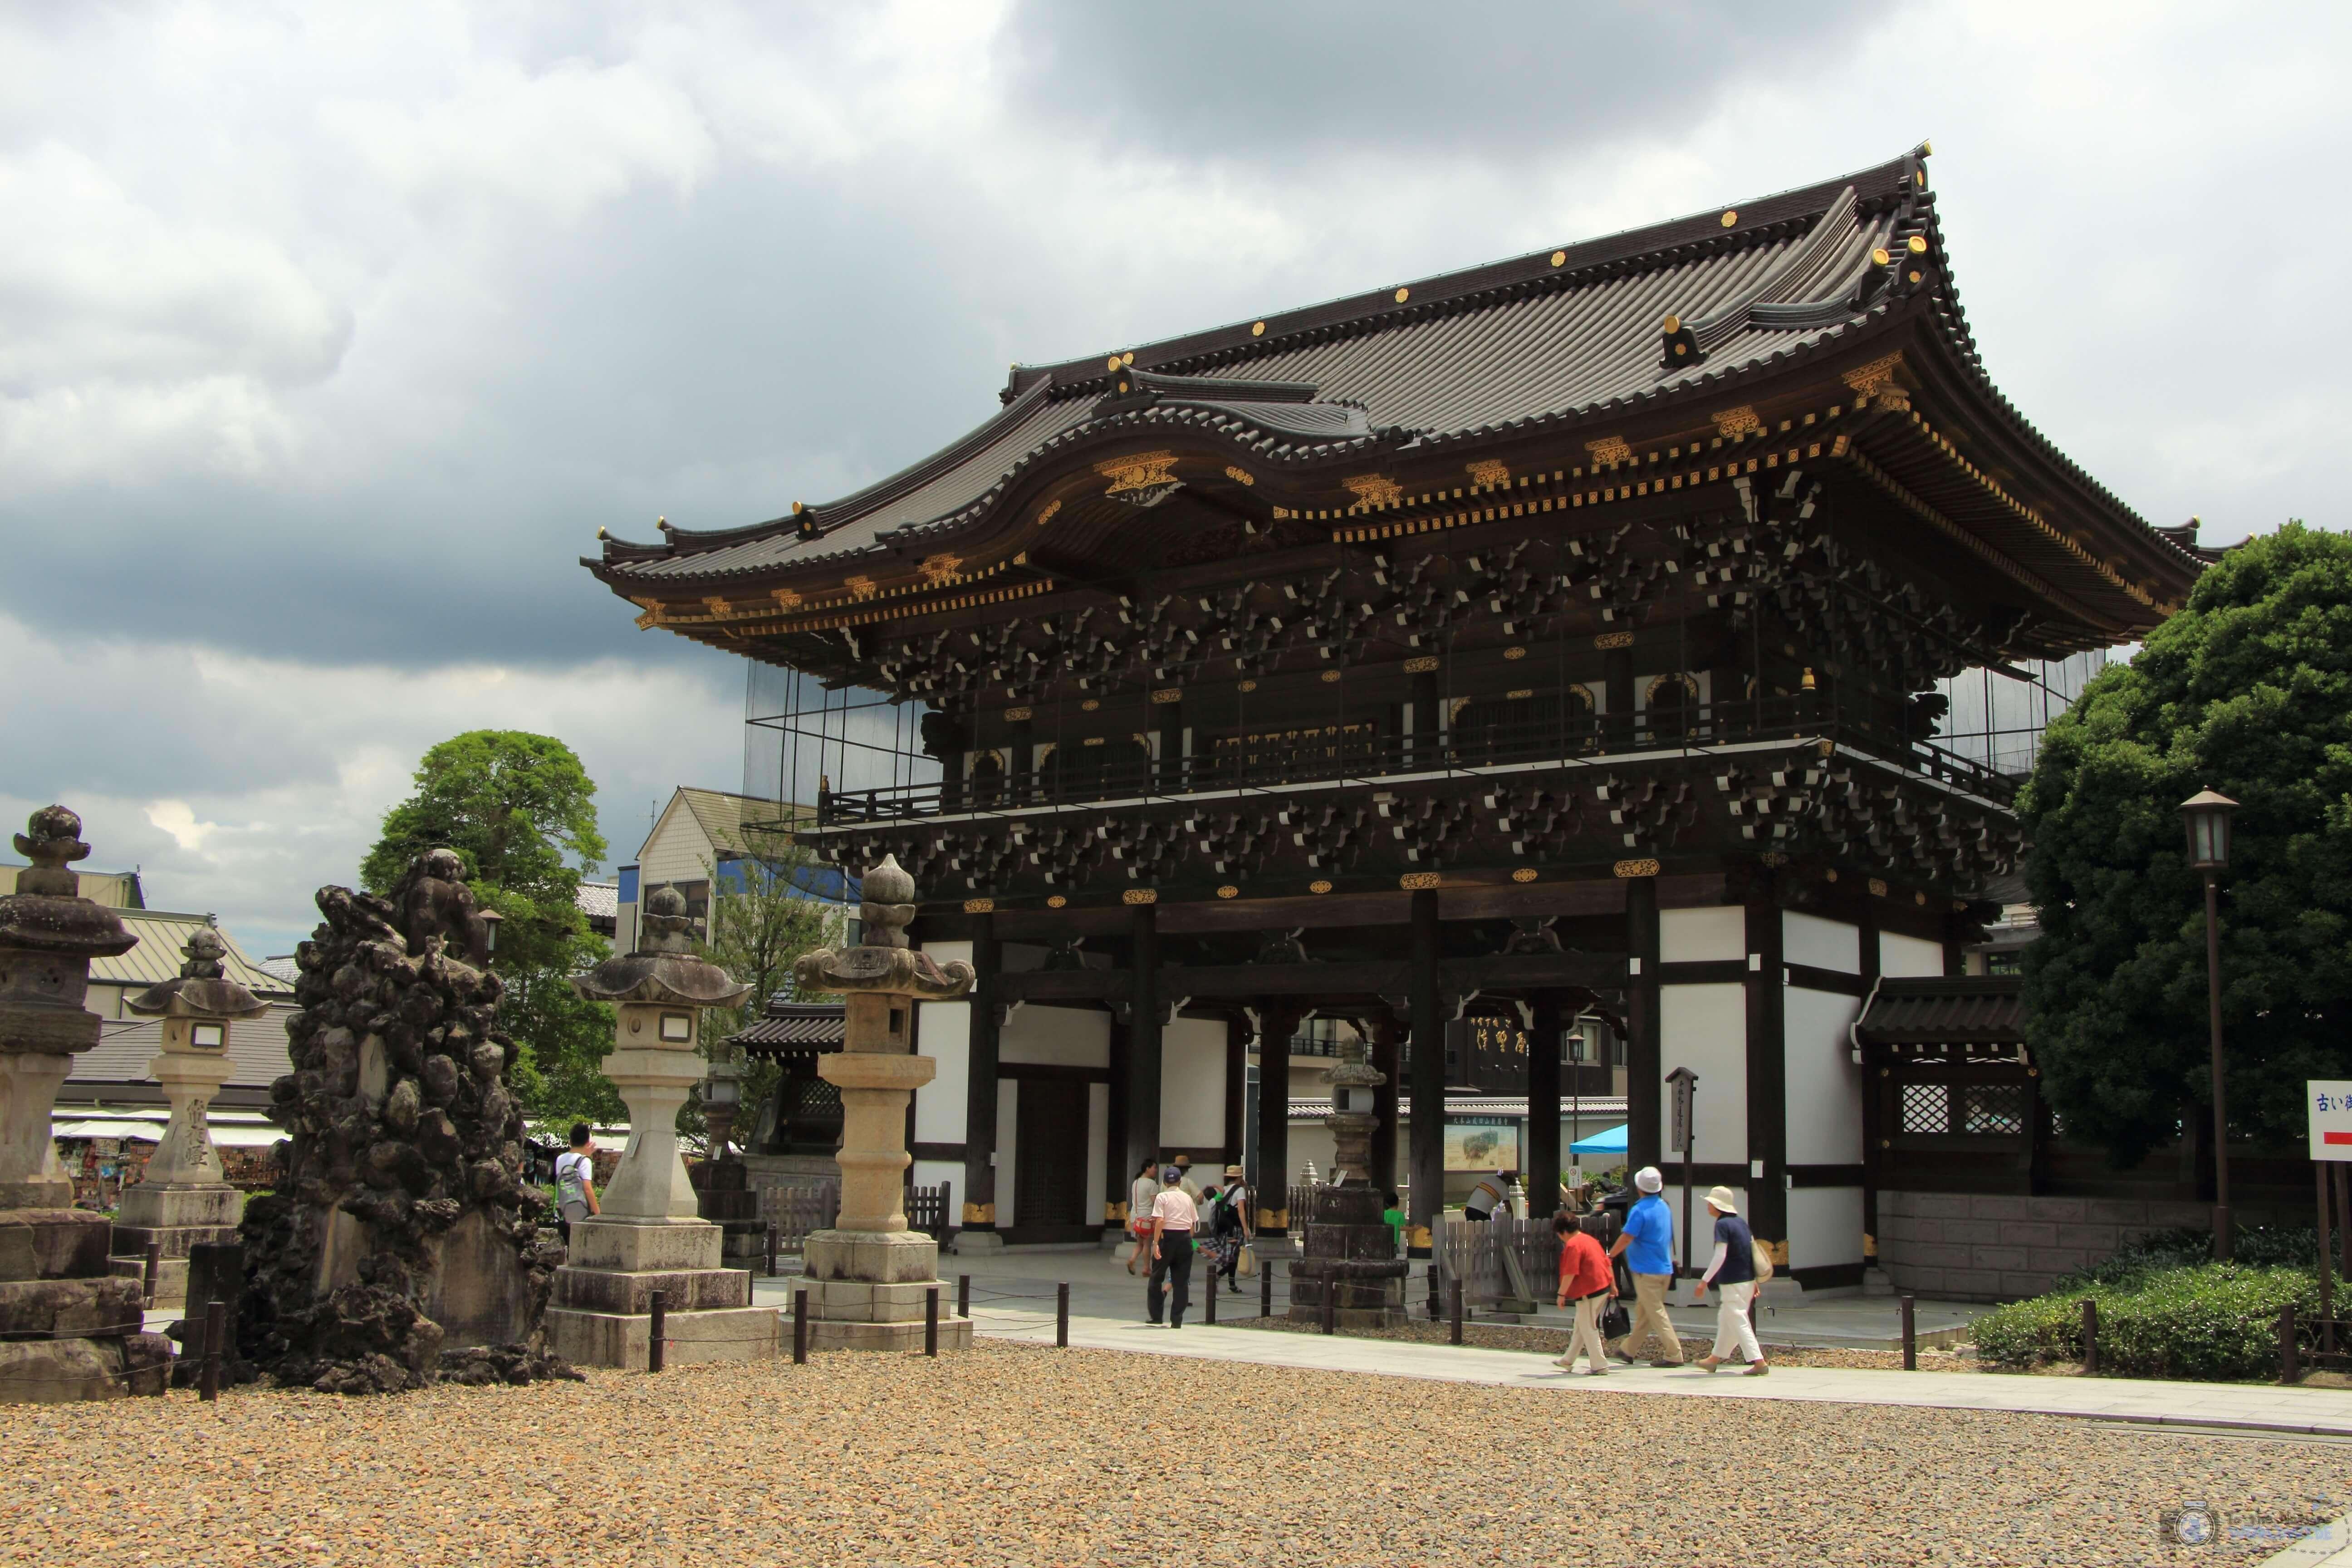 Naritasan Shinshoji Temple in Narita, Japan